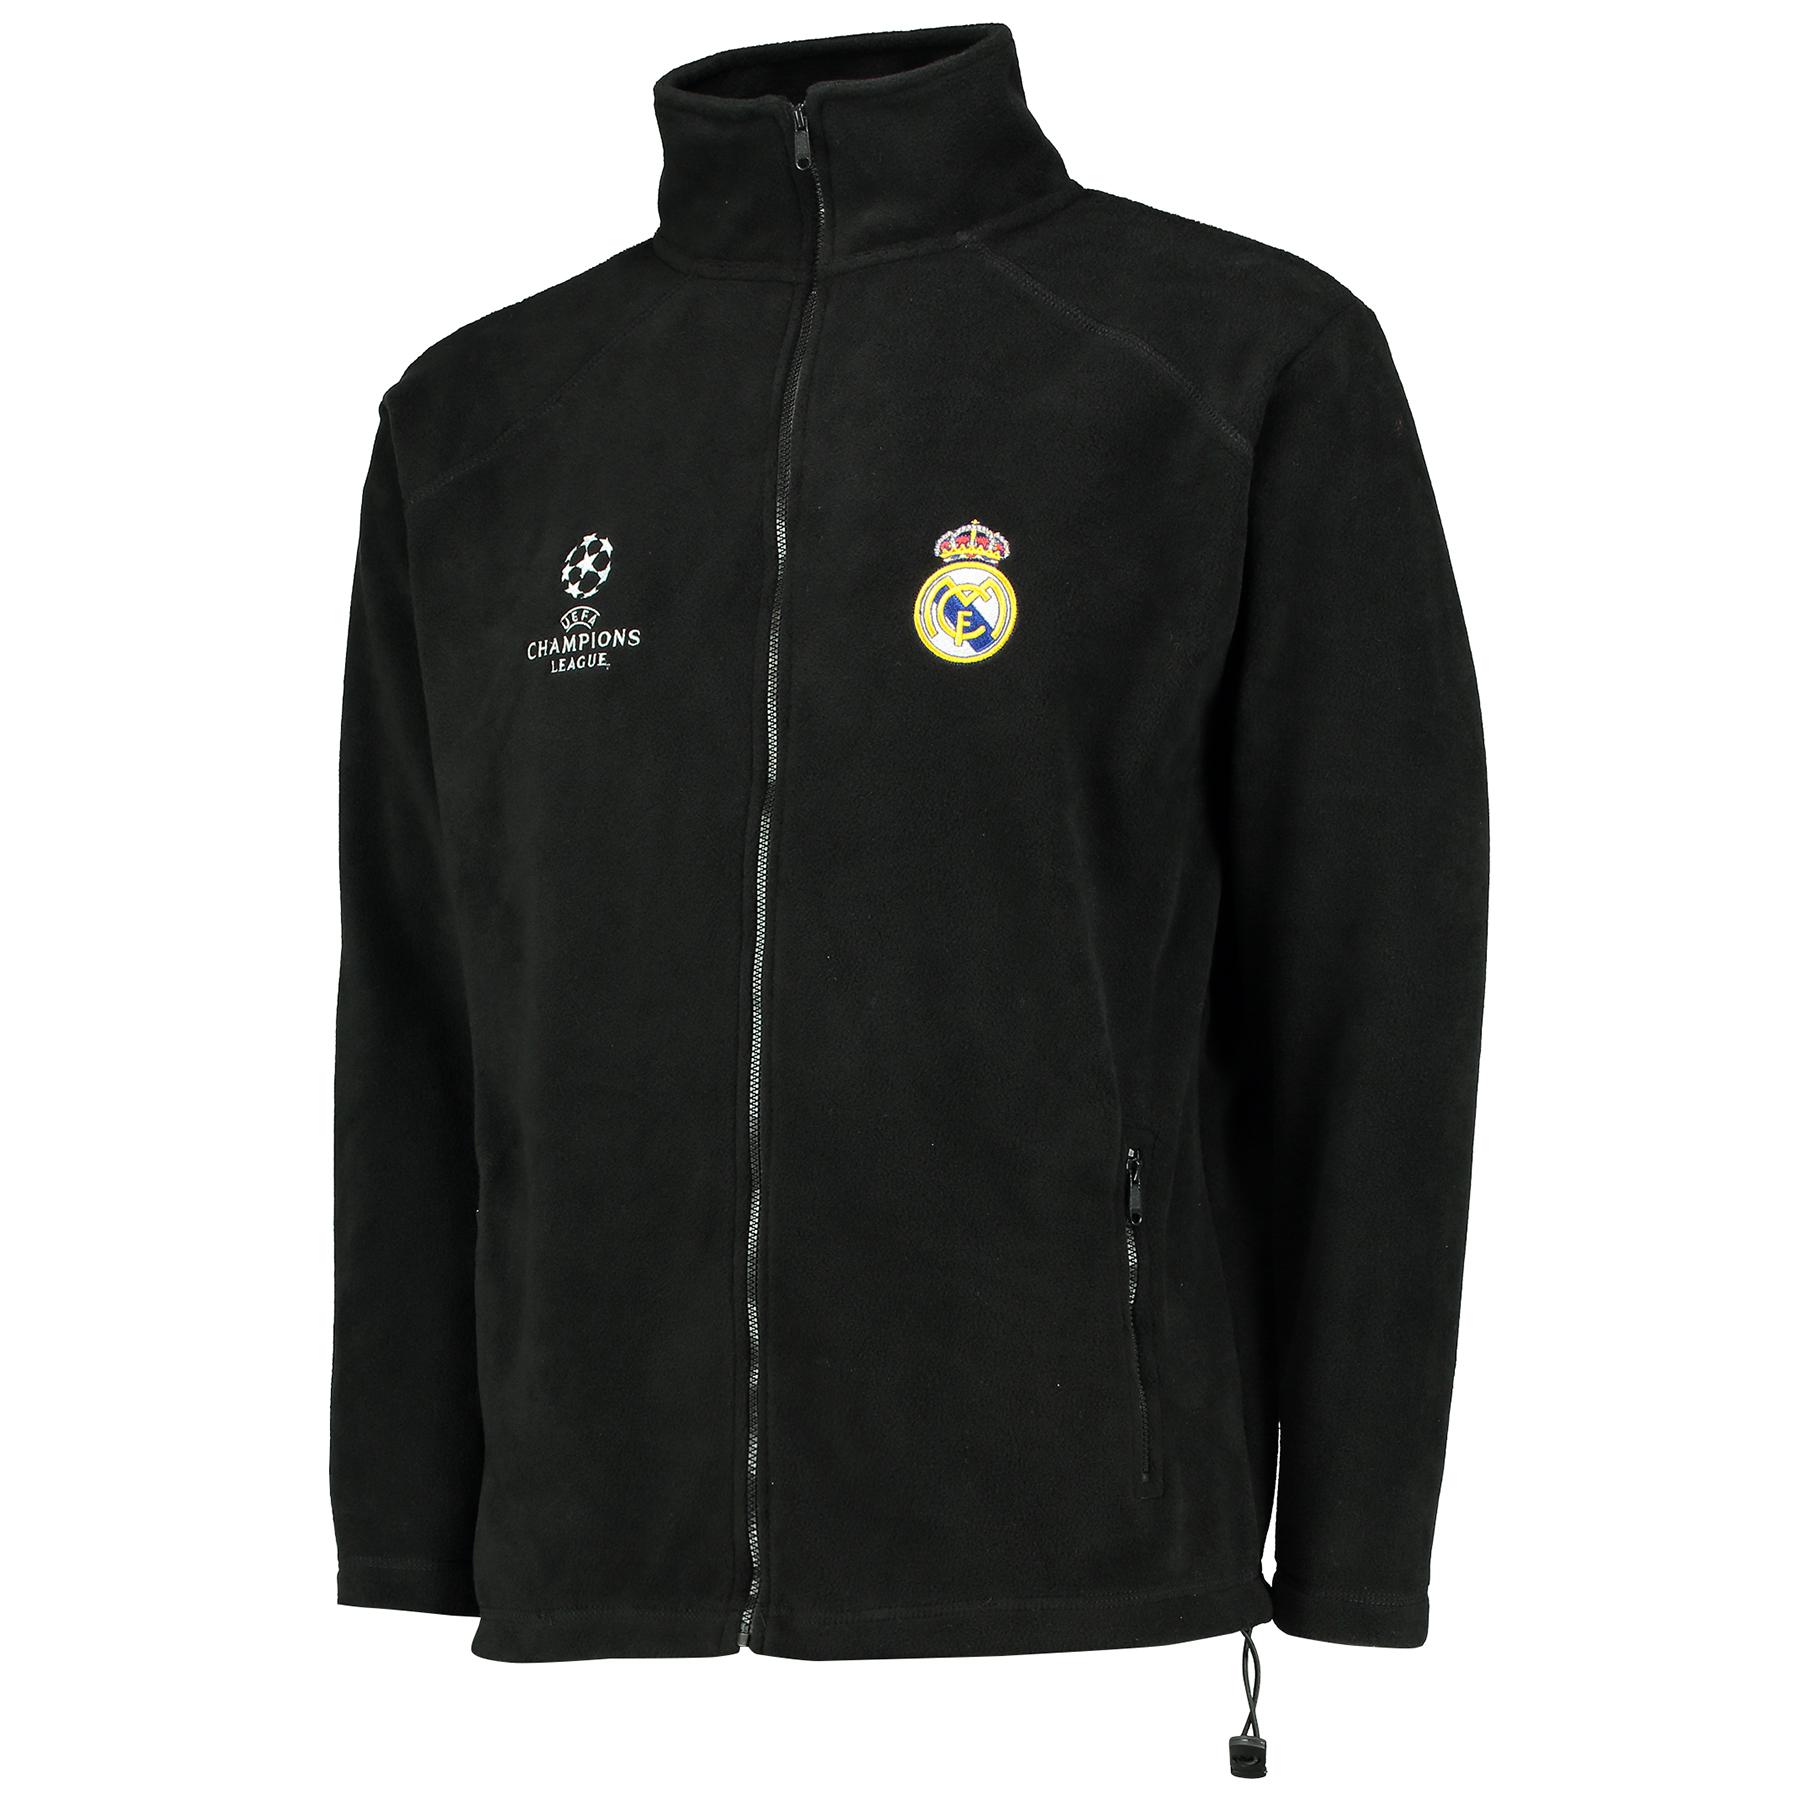 Real Madrid UEFA Champions League Fleece Jacket - Black - Mens